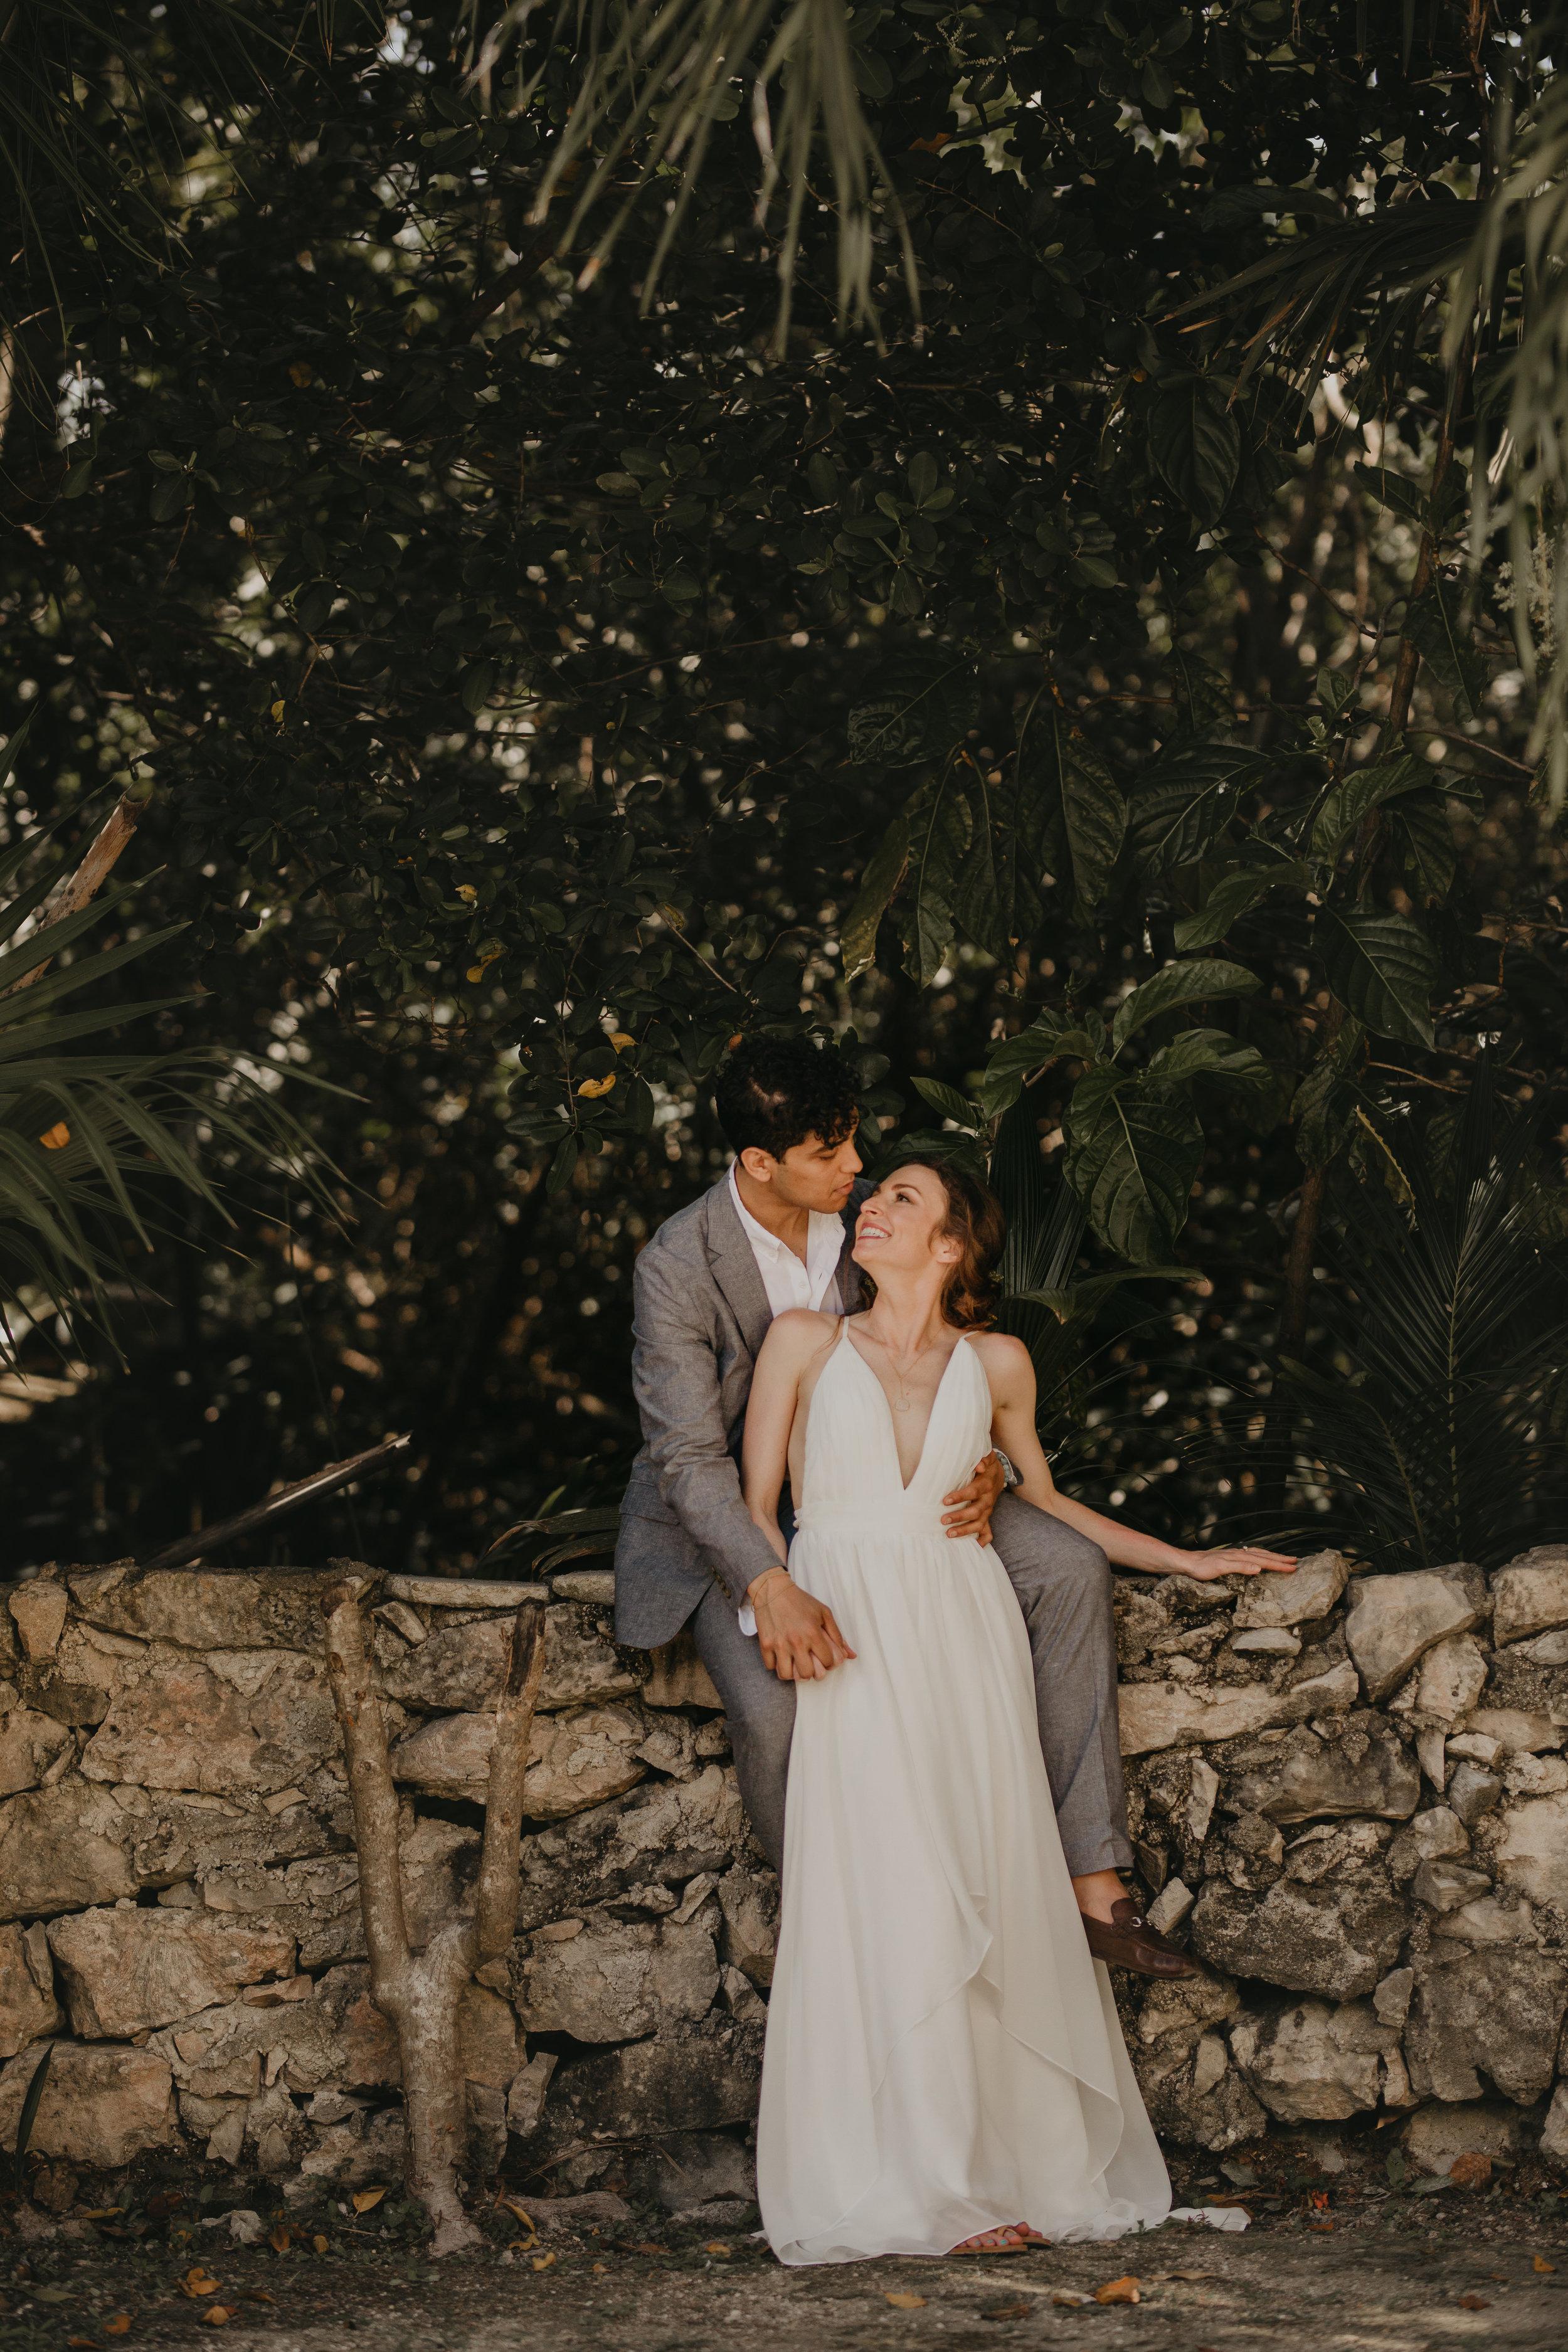 Nicole-Daacke-Photography-beachfront-akumal-destionation-wedding-tulum-mexico-elopement-photographer-destination-wedding-inspiration-sunset-champagne-pop-boho-bride-ocean-tropical-bohemian-tulum-wedding-photos-133.jpg